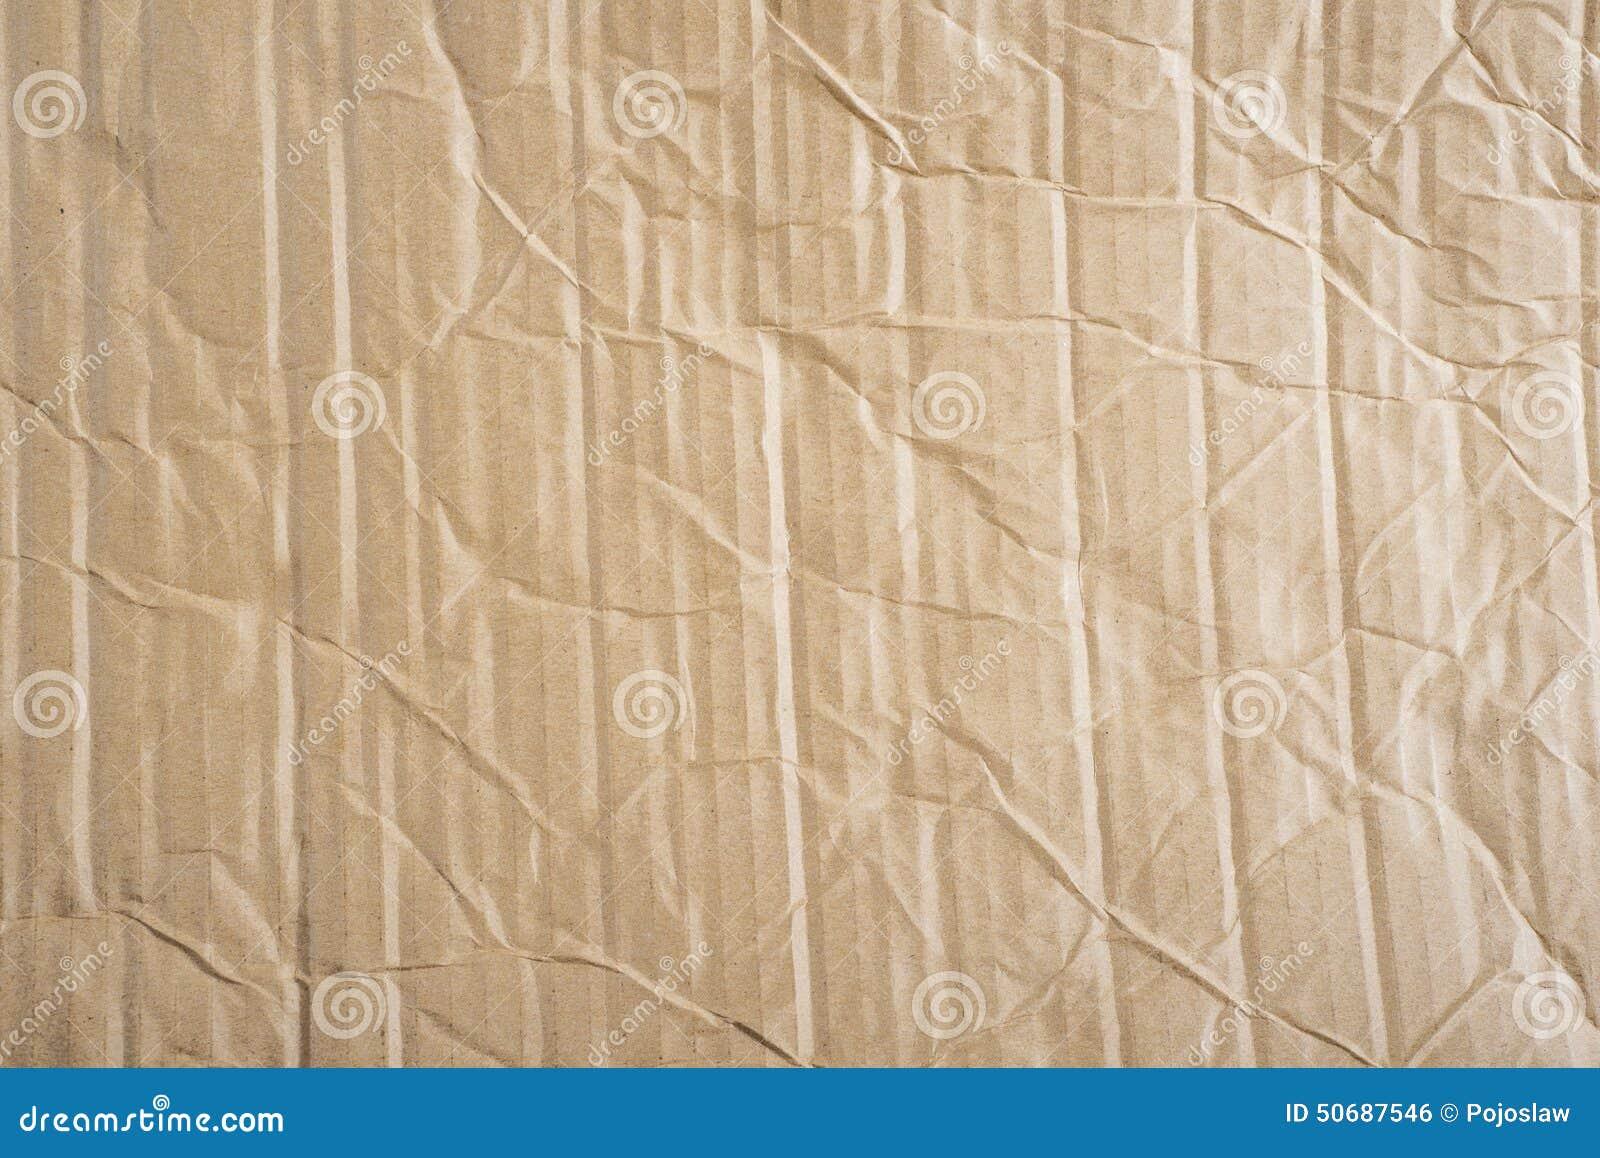 Download 纸盒背景 库存照片. 图片 包括有 弄皱, 年龄, 织地不很细, 土气, 折痕, 背包, 盖子, 纸张, 抽象 - 50687546